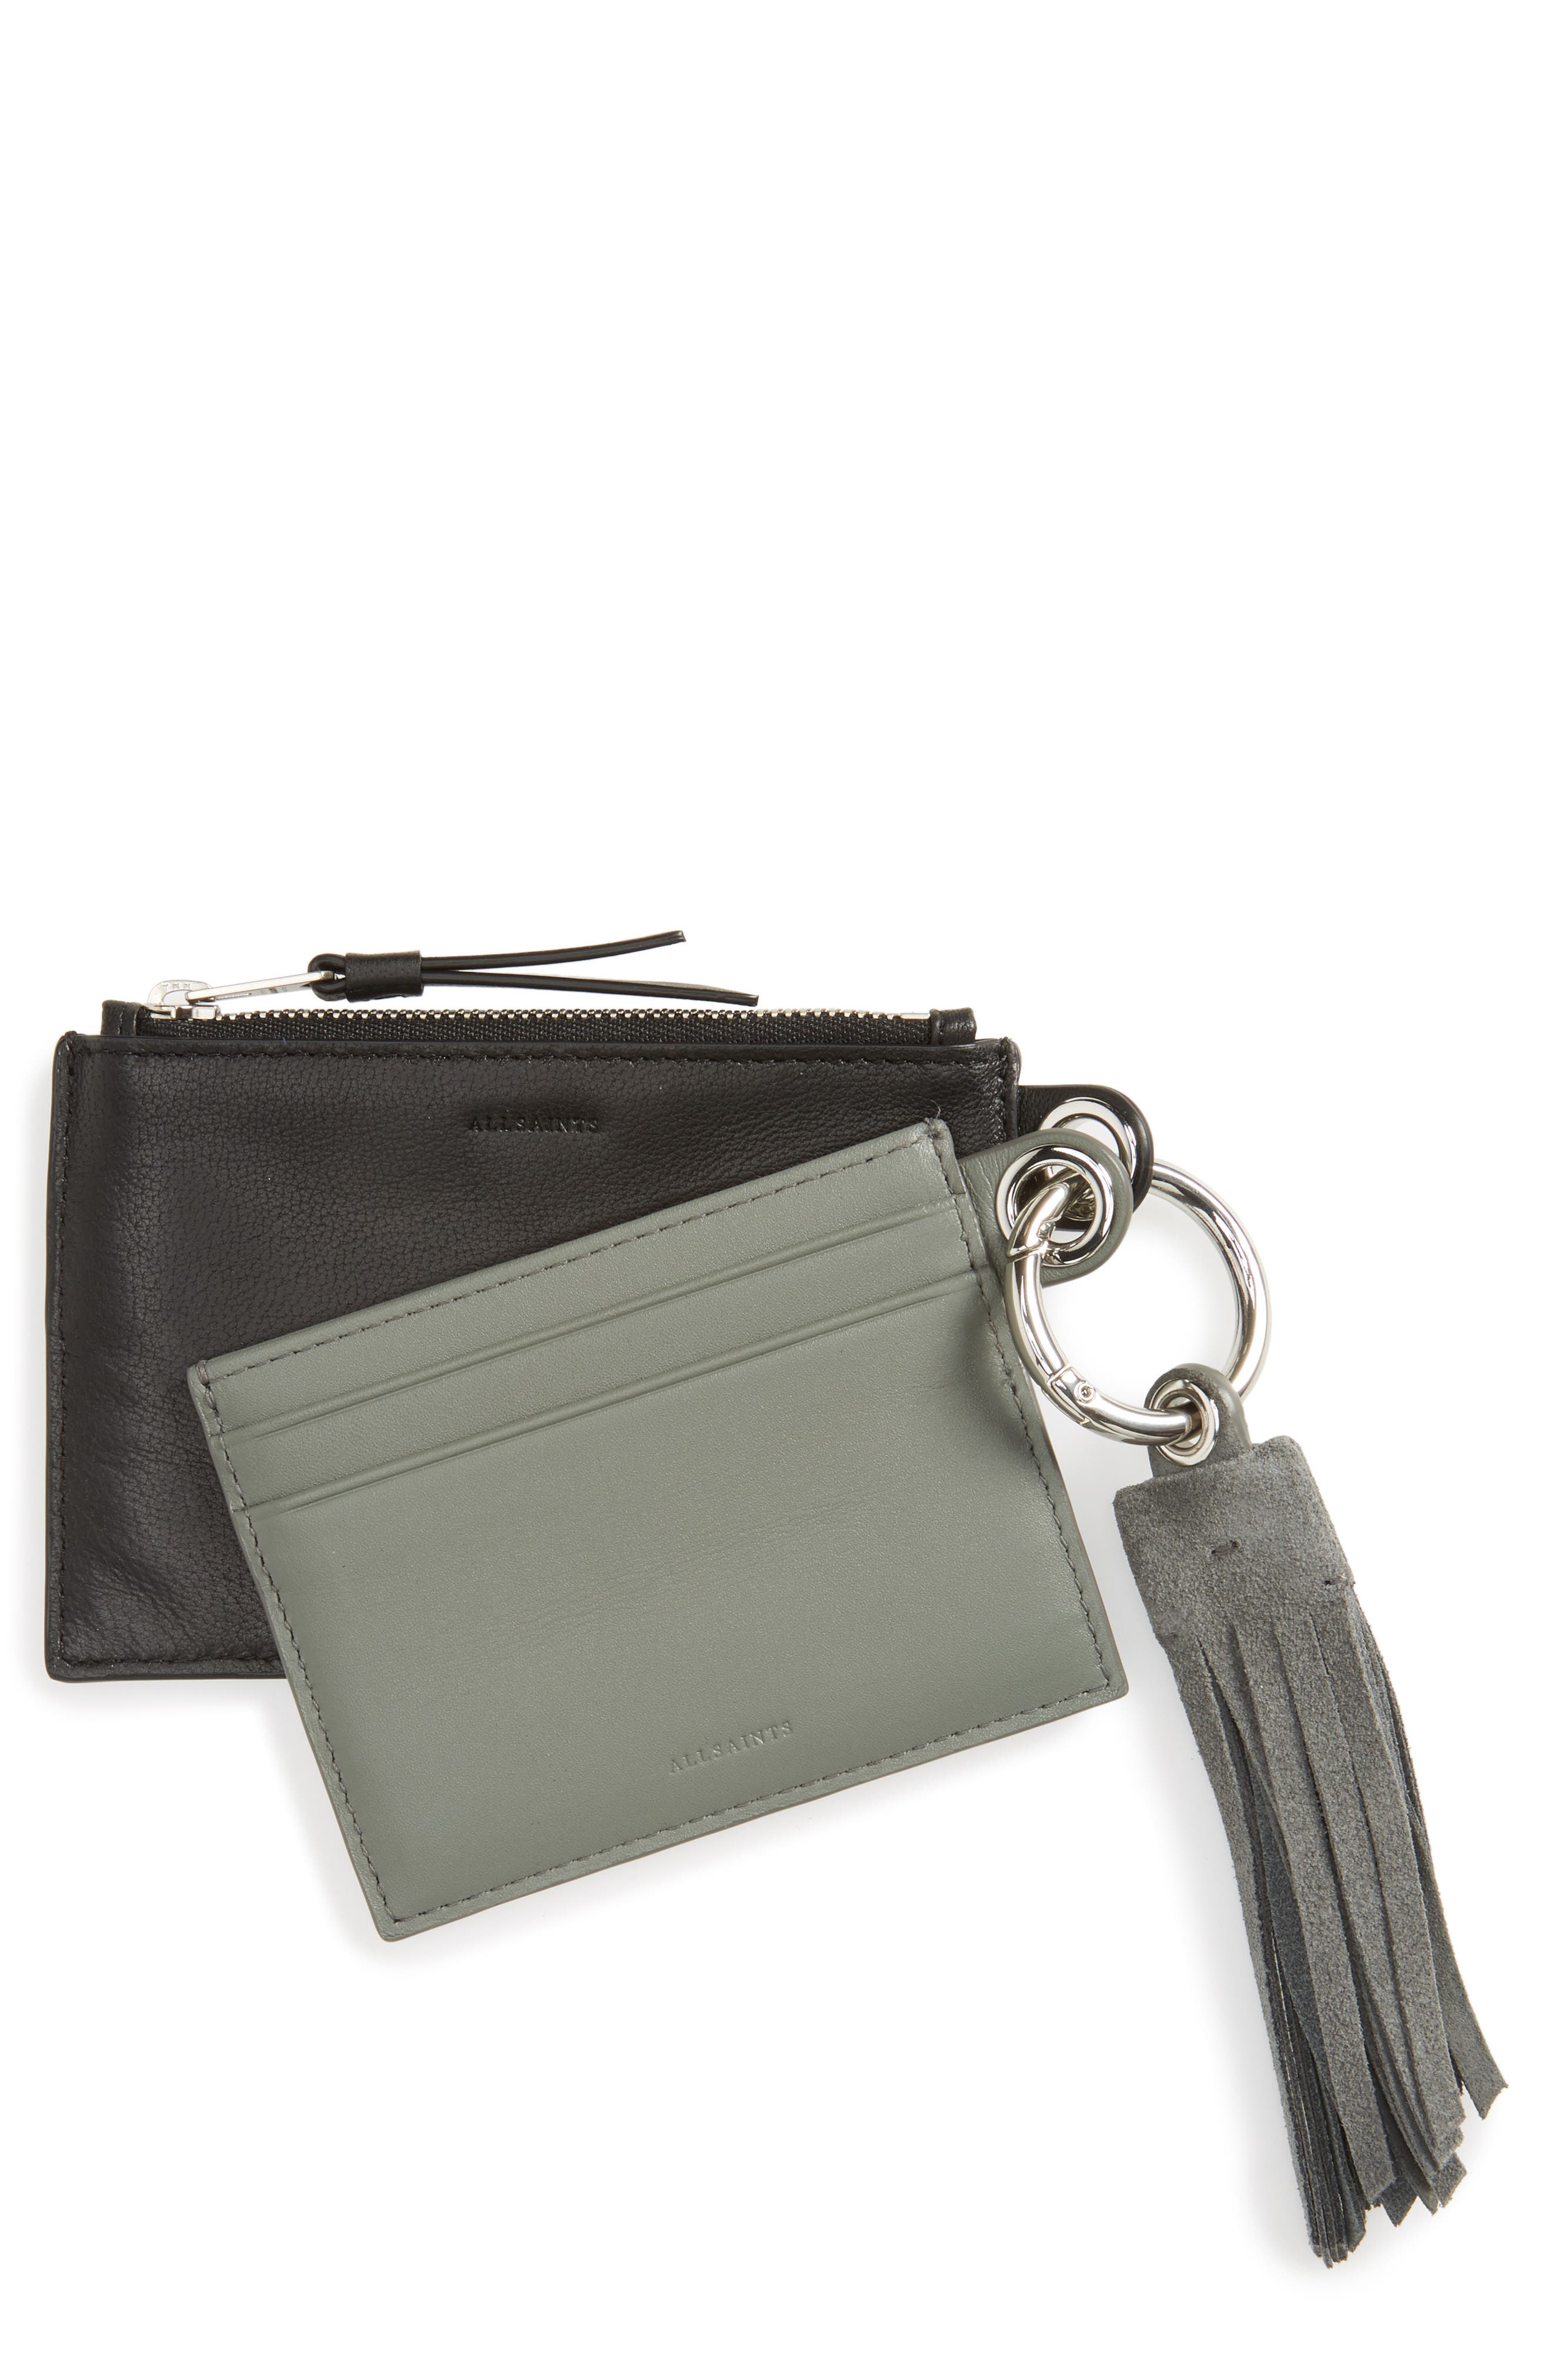 ALLSAINTS Dive Keyfob Lambskin Leather Zip Pouch & Card Case